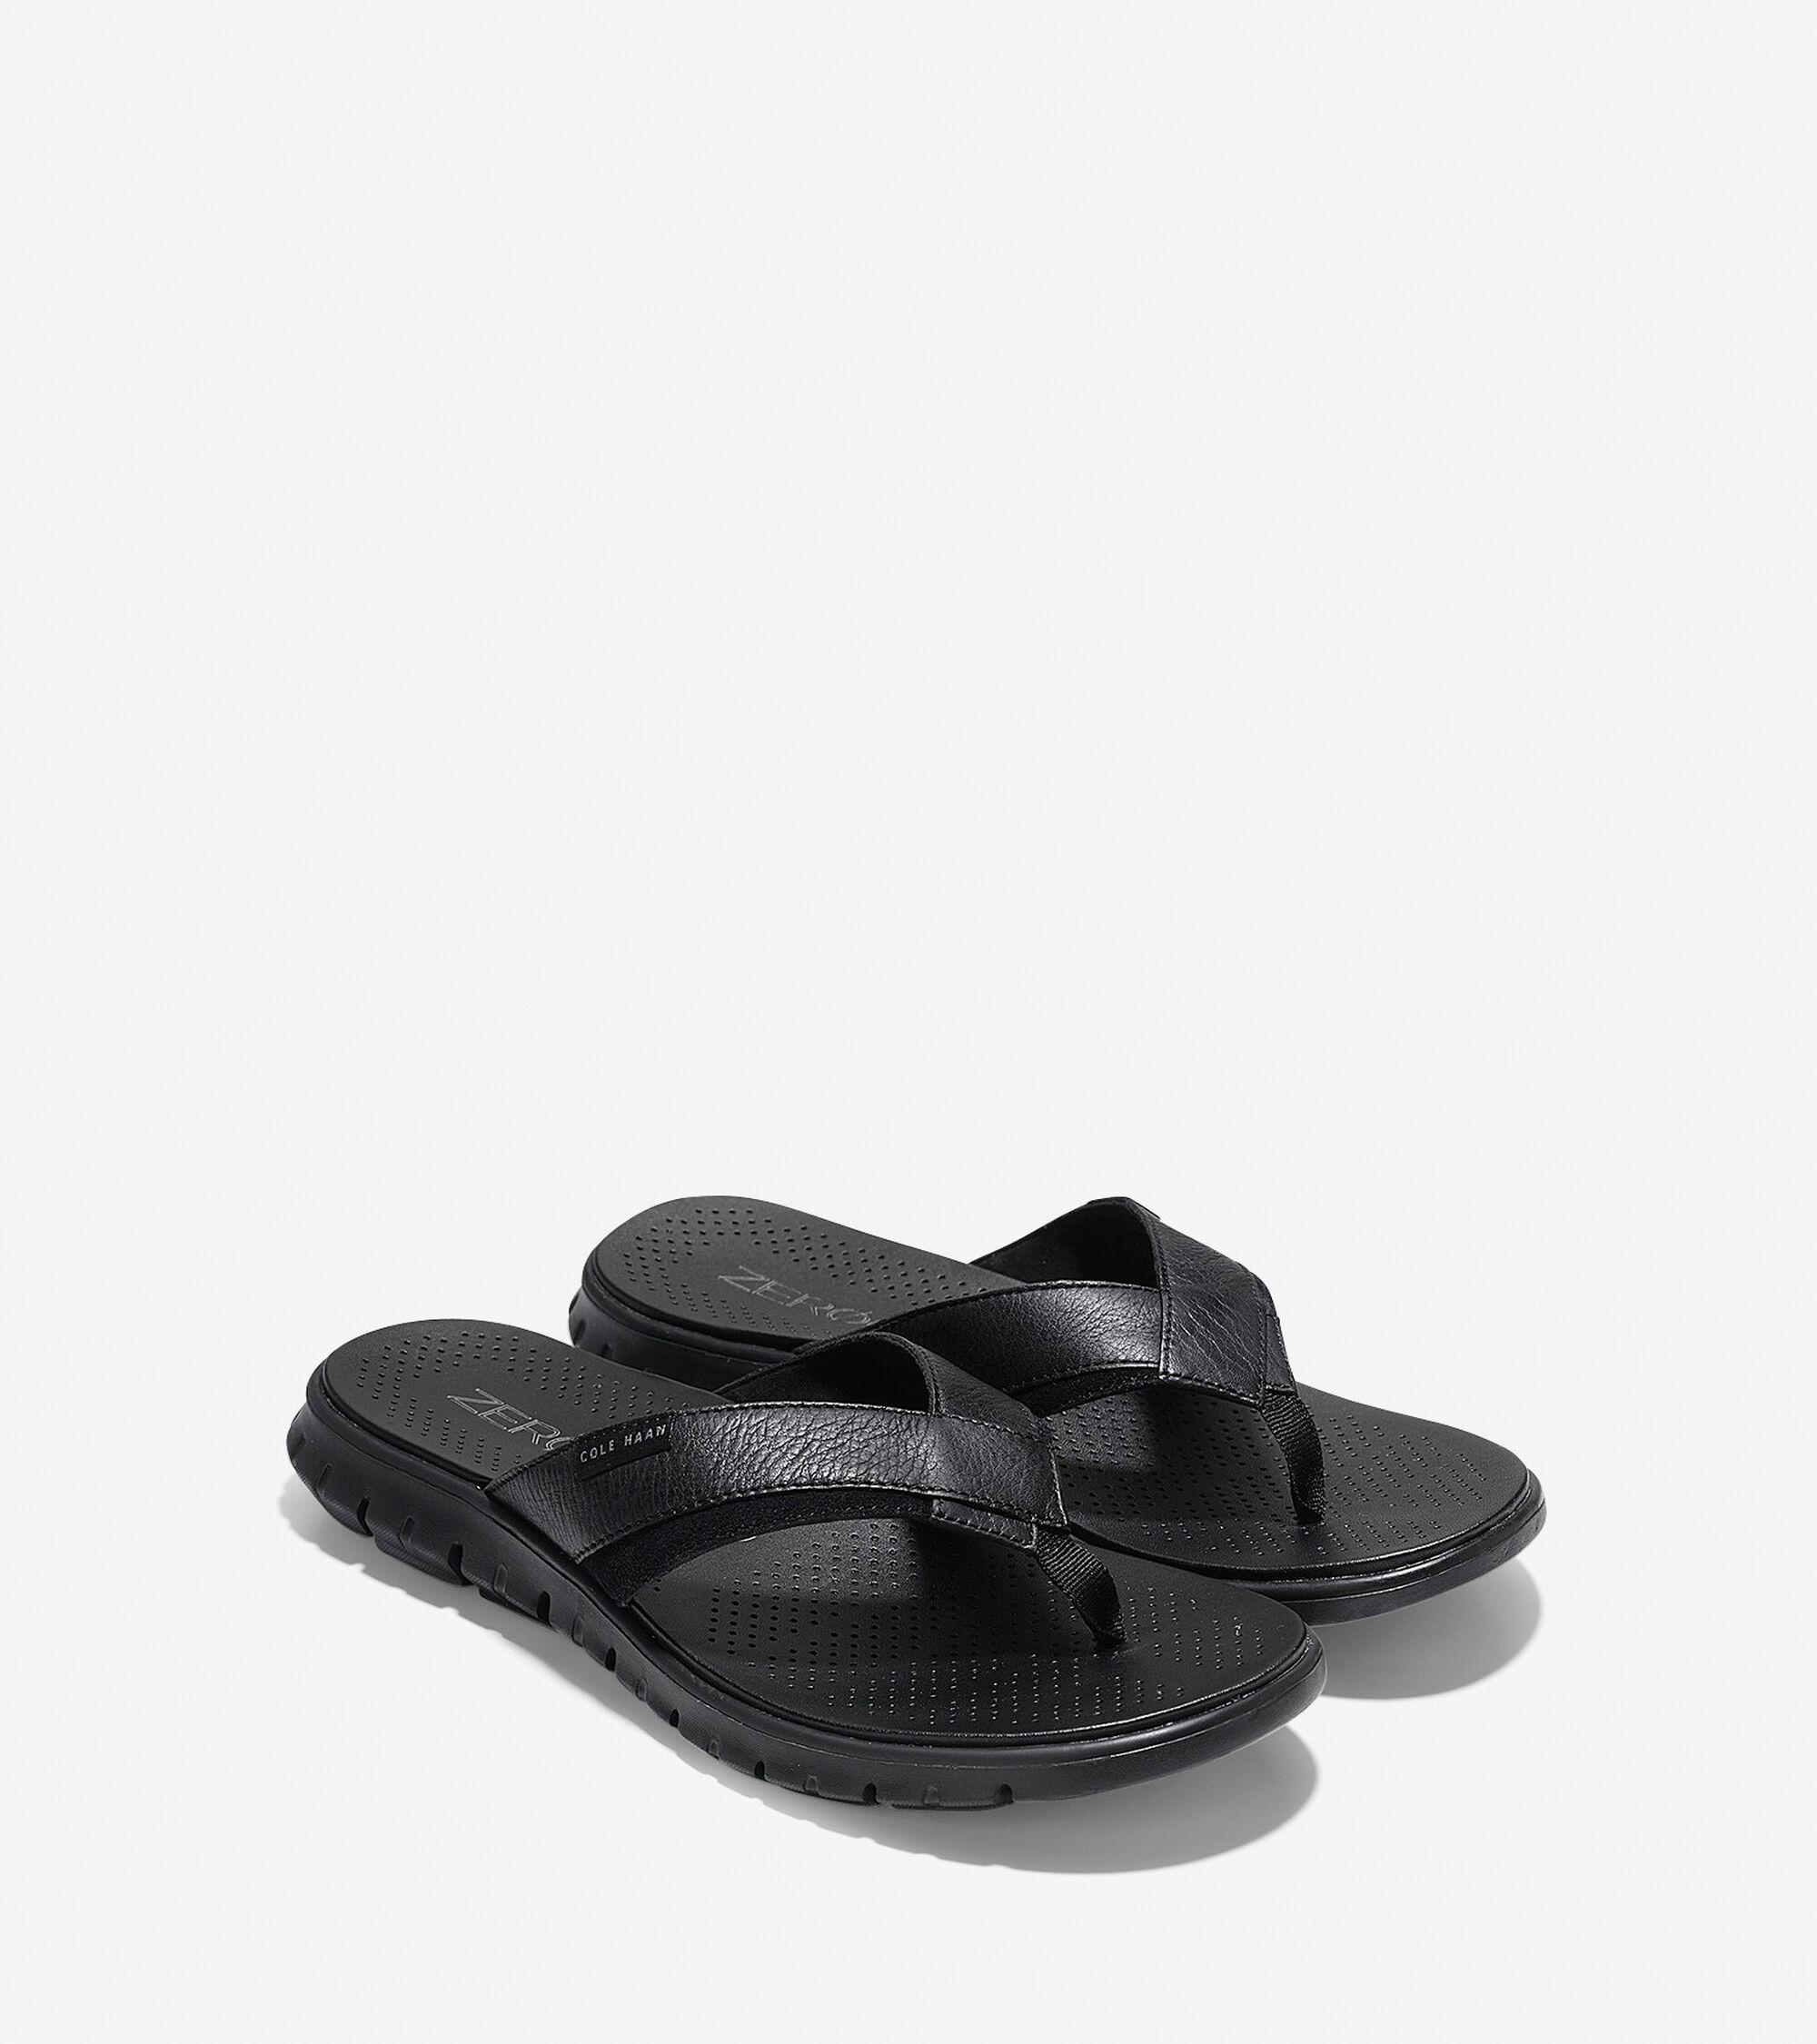 fd6a2f5016a Men s ZEROGRAND Fold Thong Sandals in Black